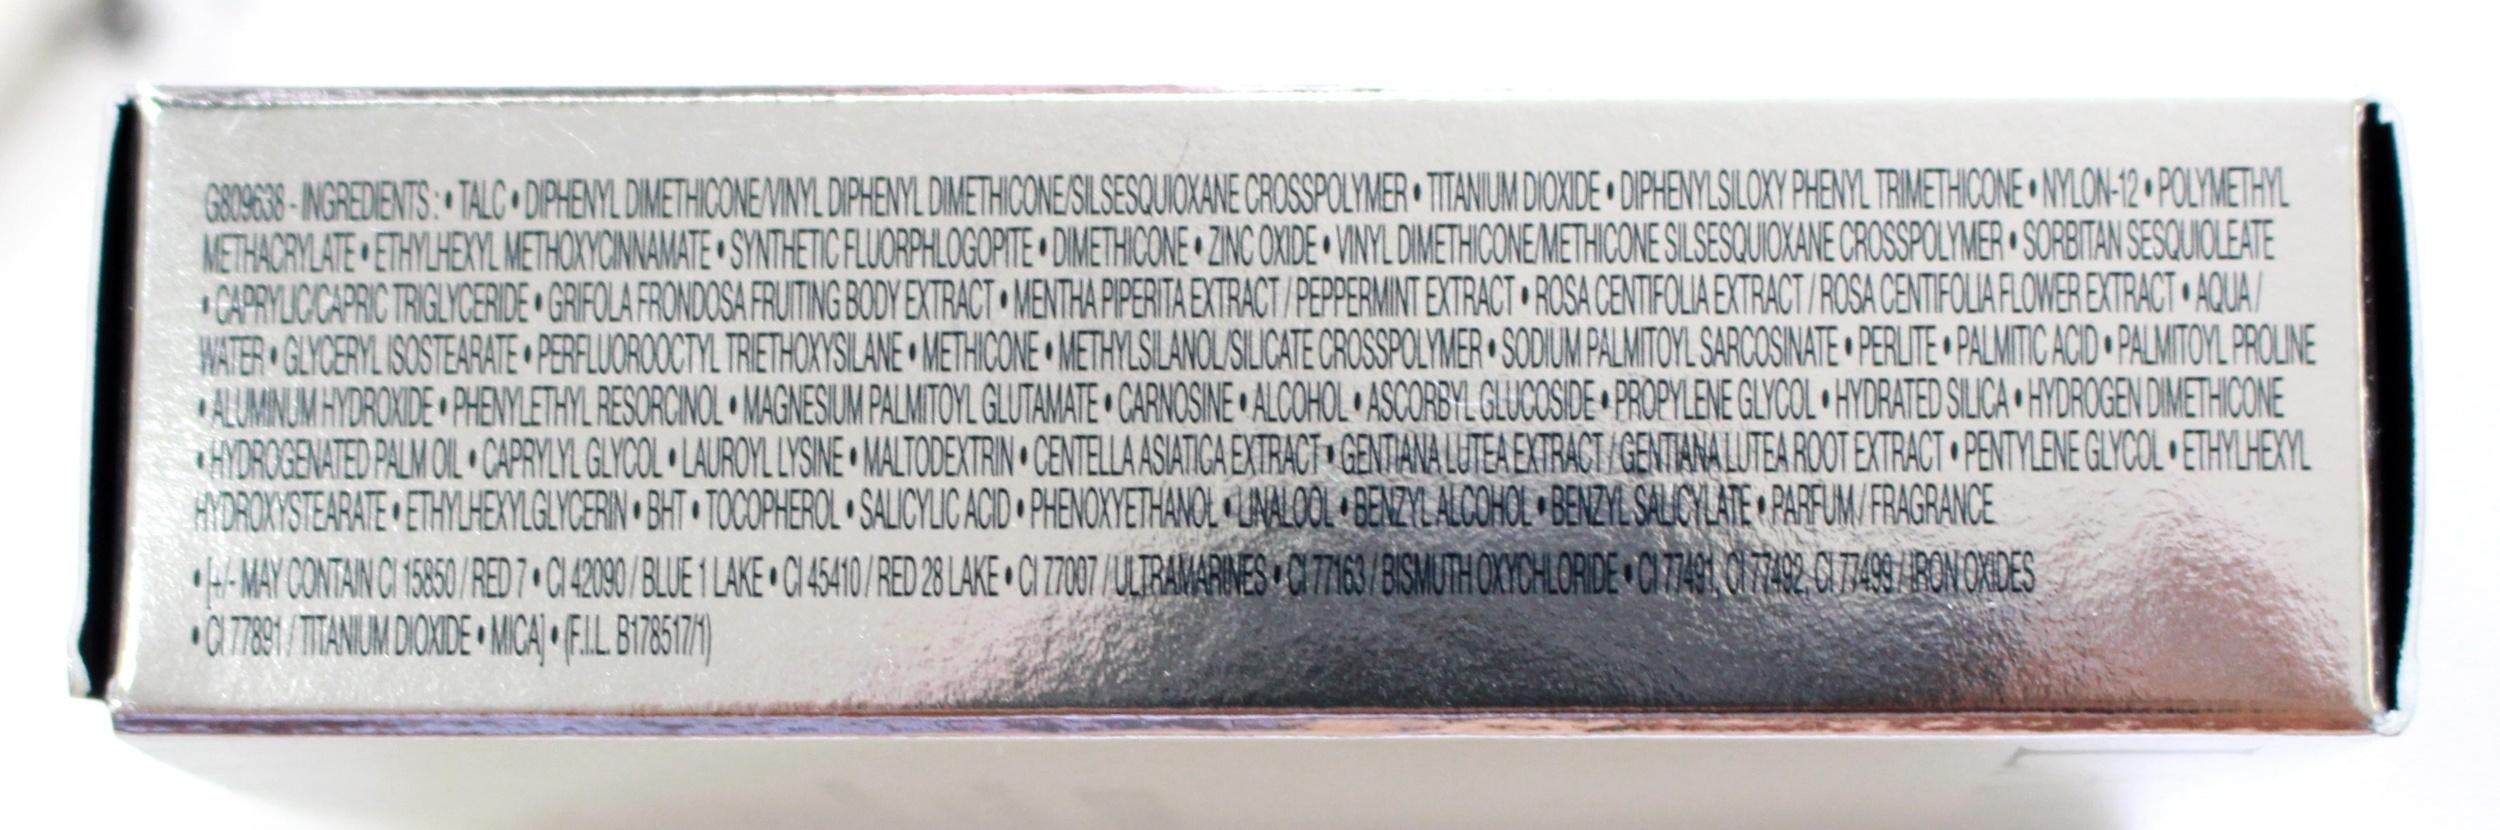 Lancôme Blanc Expert Foundation ingredients